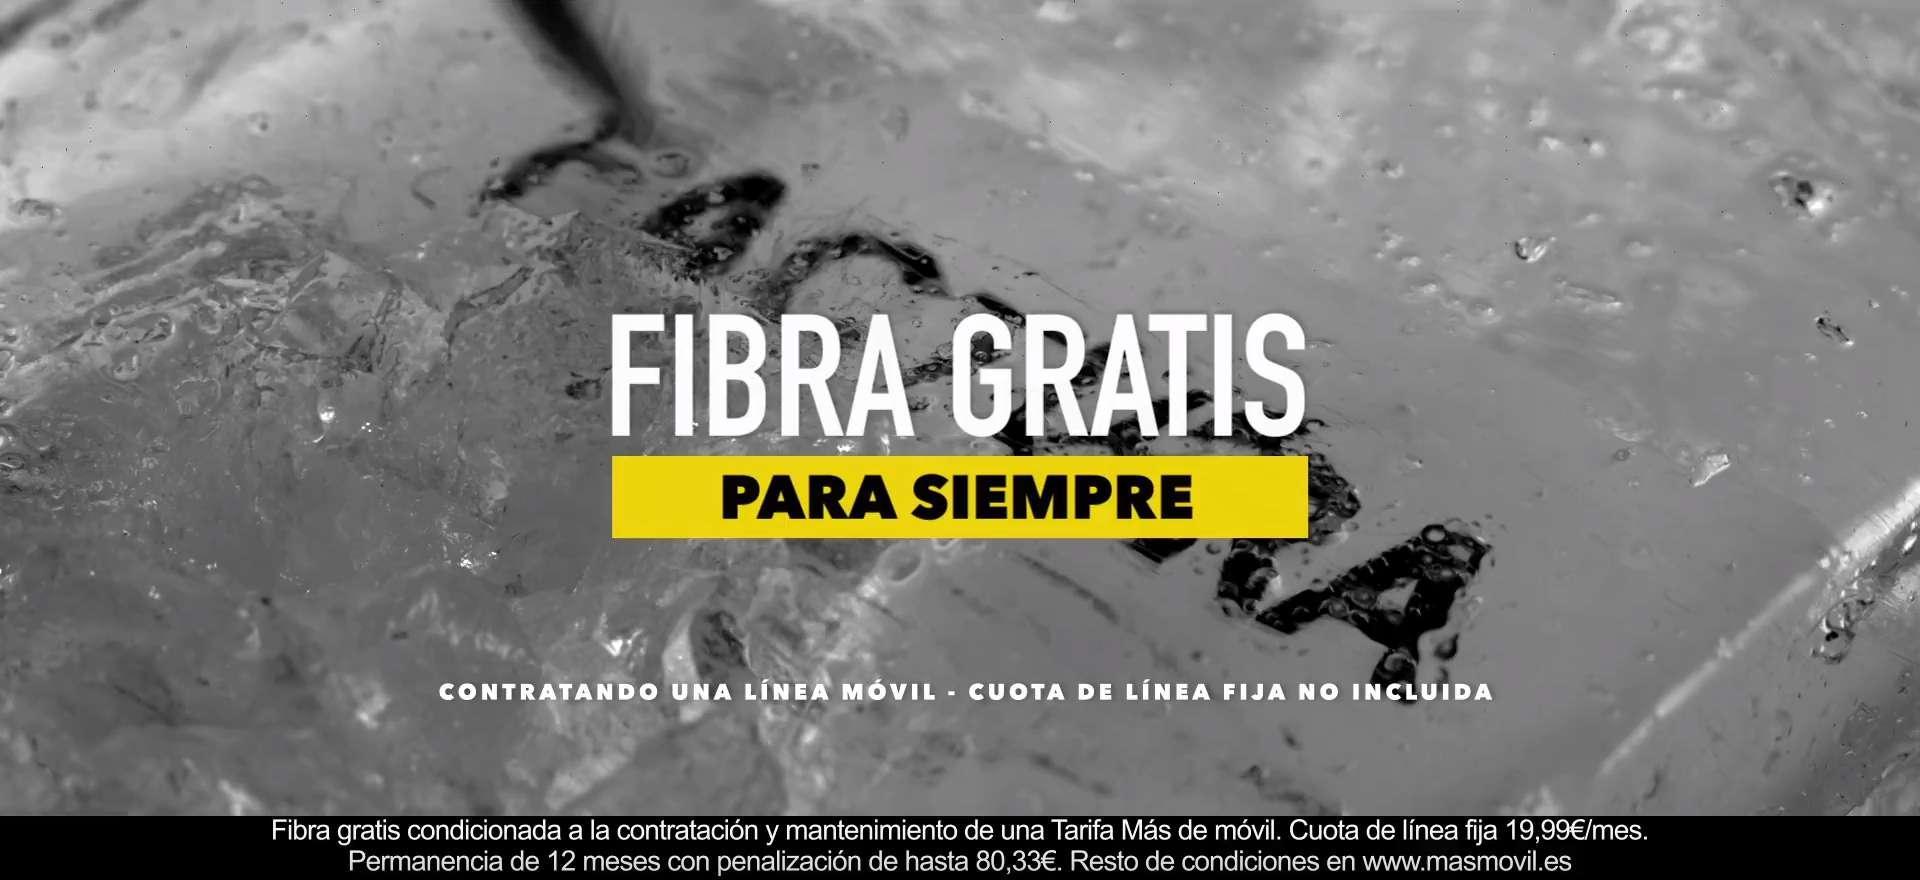 fibra gratis